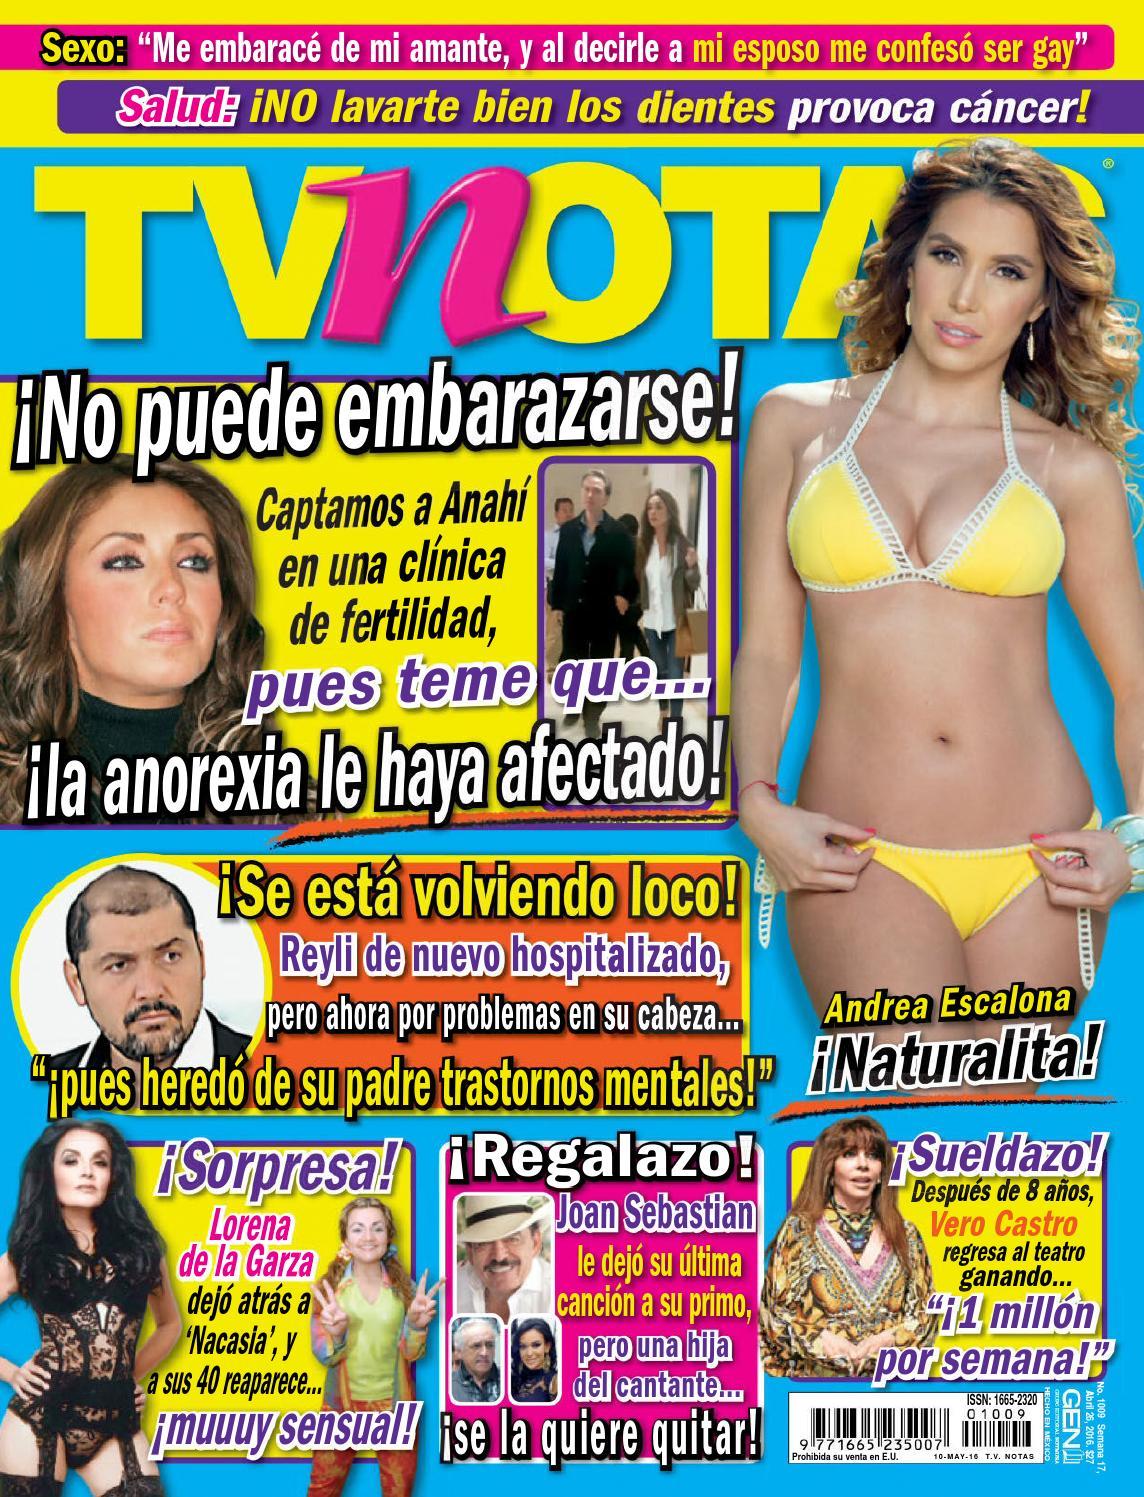 Anette Michel Descuidos tvnote 2016-04-16trần anh trinh - issuu